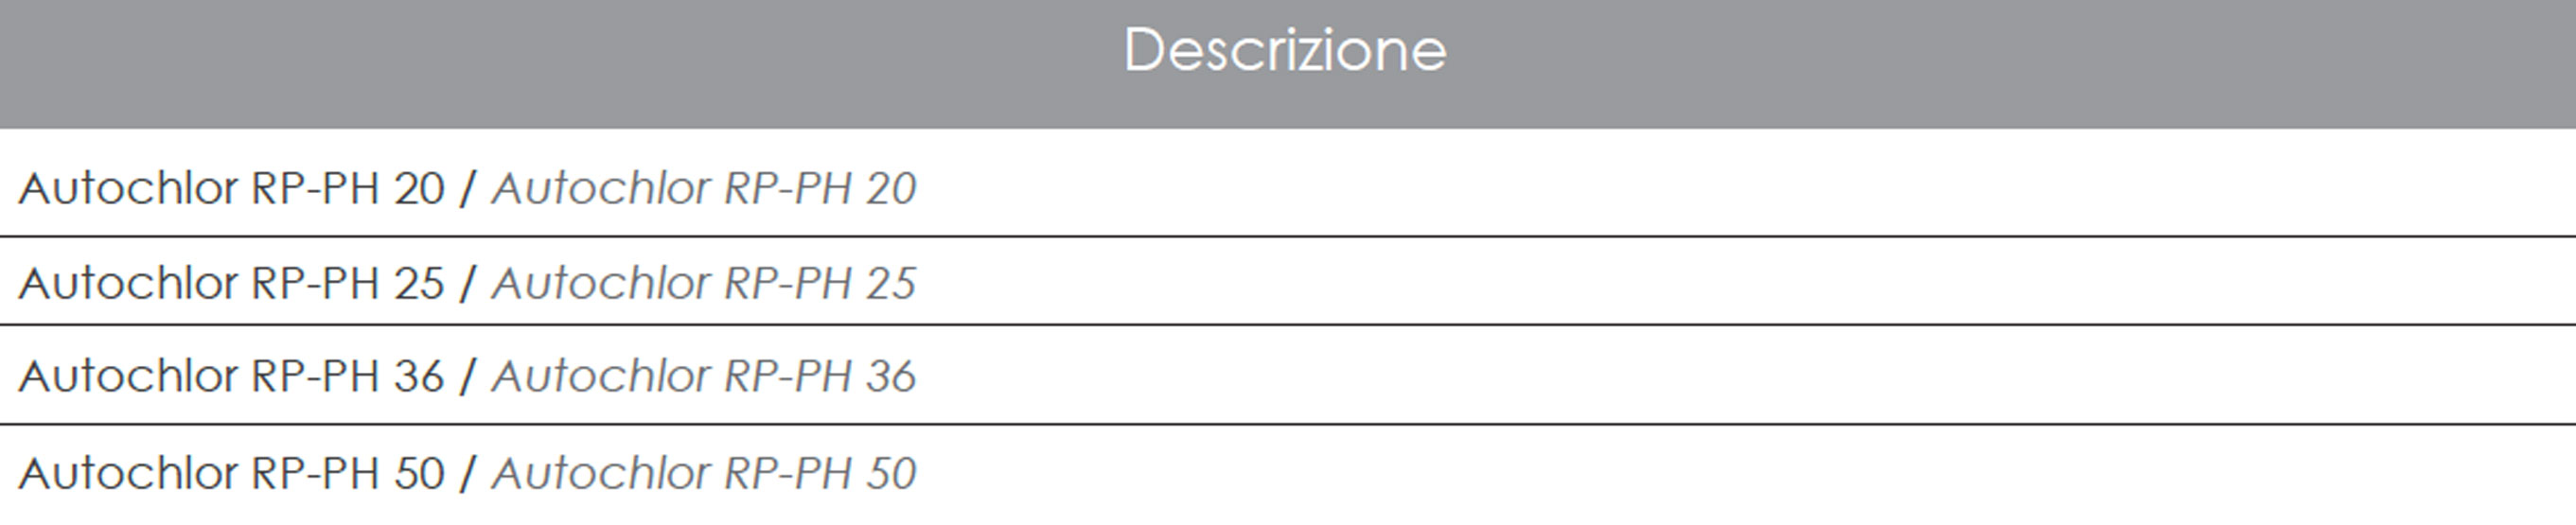 autochlor-rpph-controllo-livello-ph